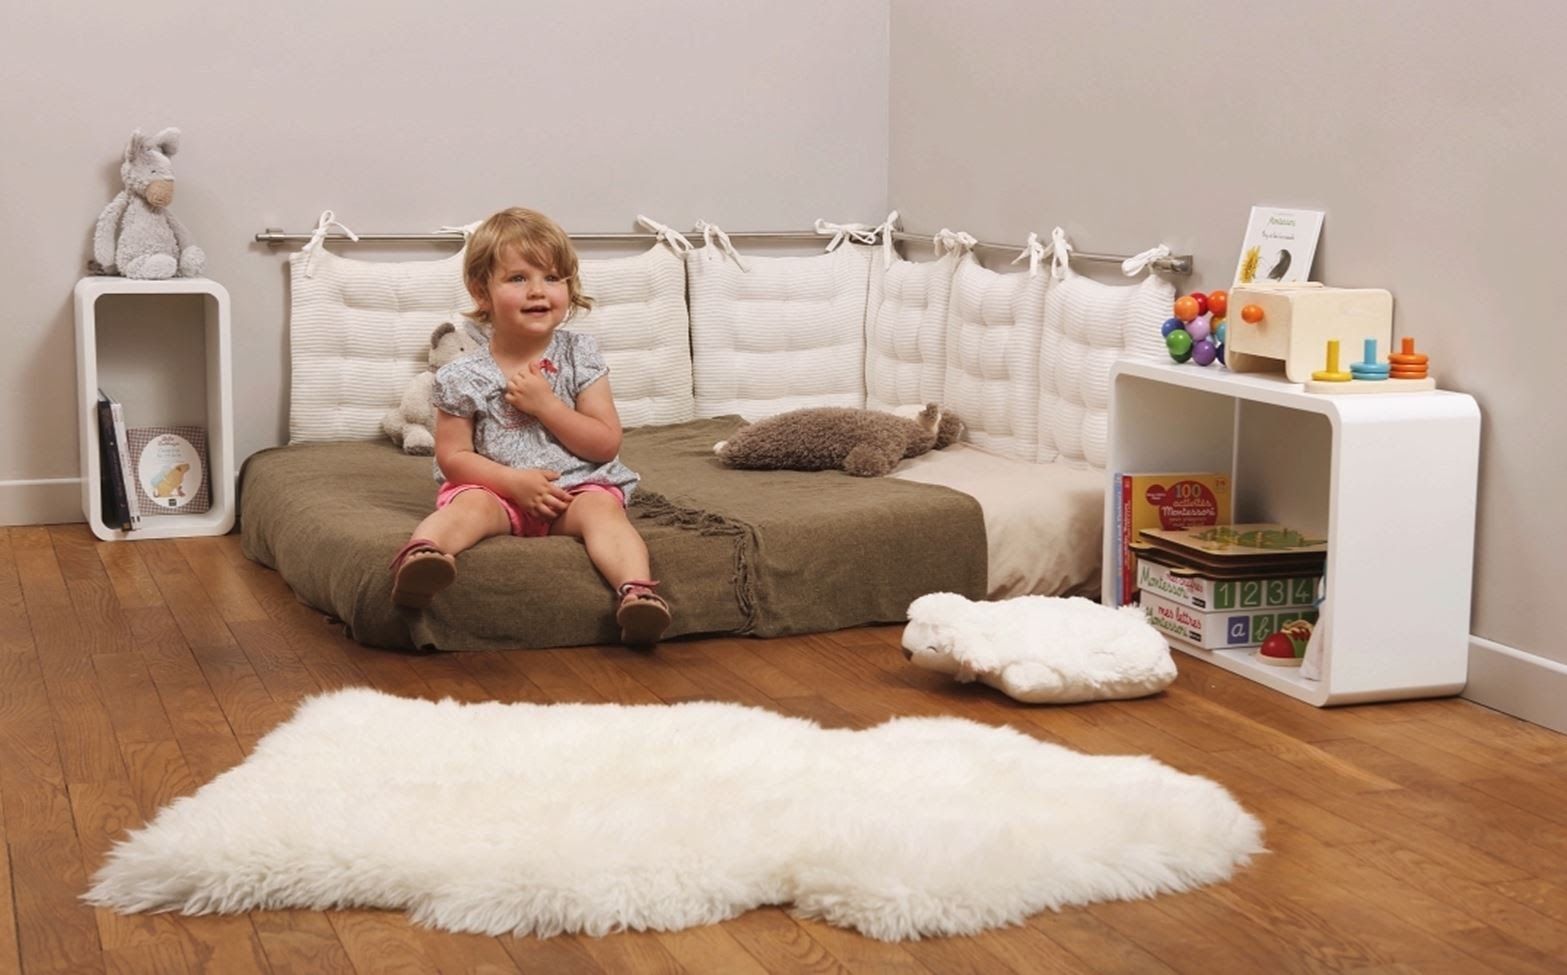 Lit bebe sans barreau montessori - Fabriquer lit montessori ...